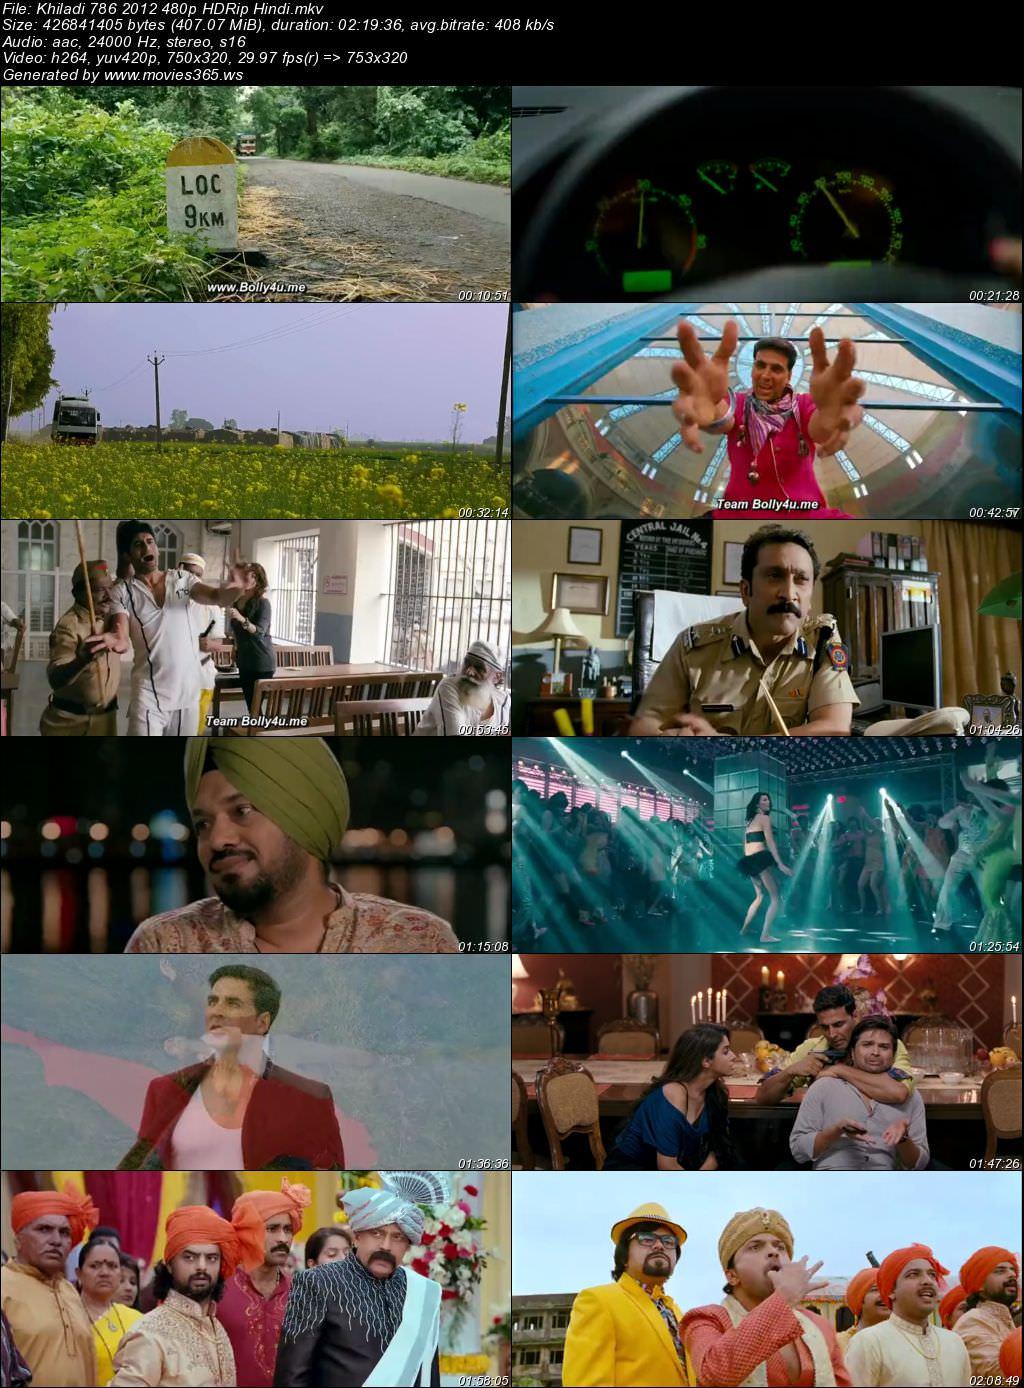 Khiladi 786 2012 Full Hindi Movie 480p HDRip 400MB